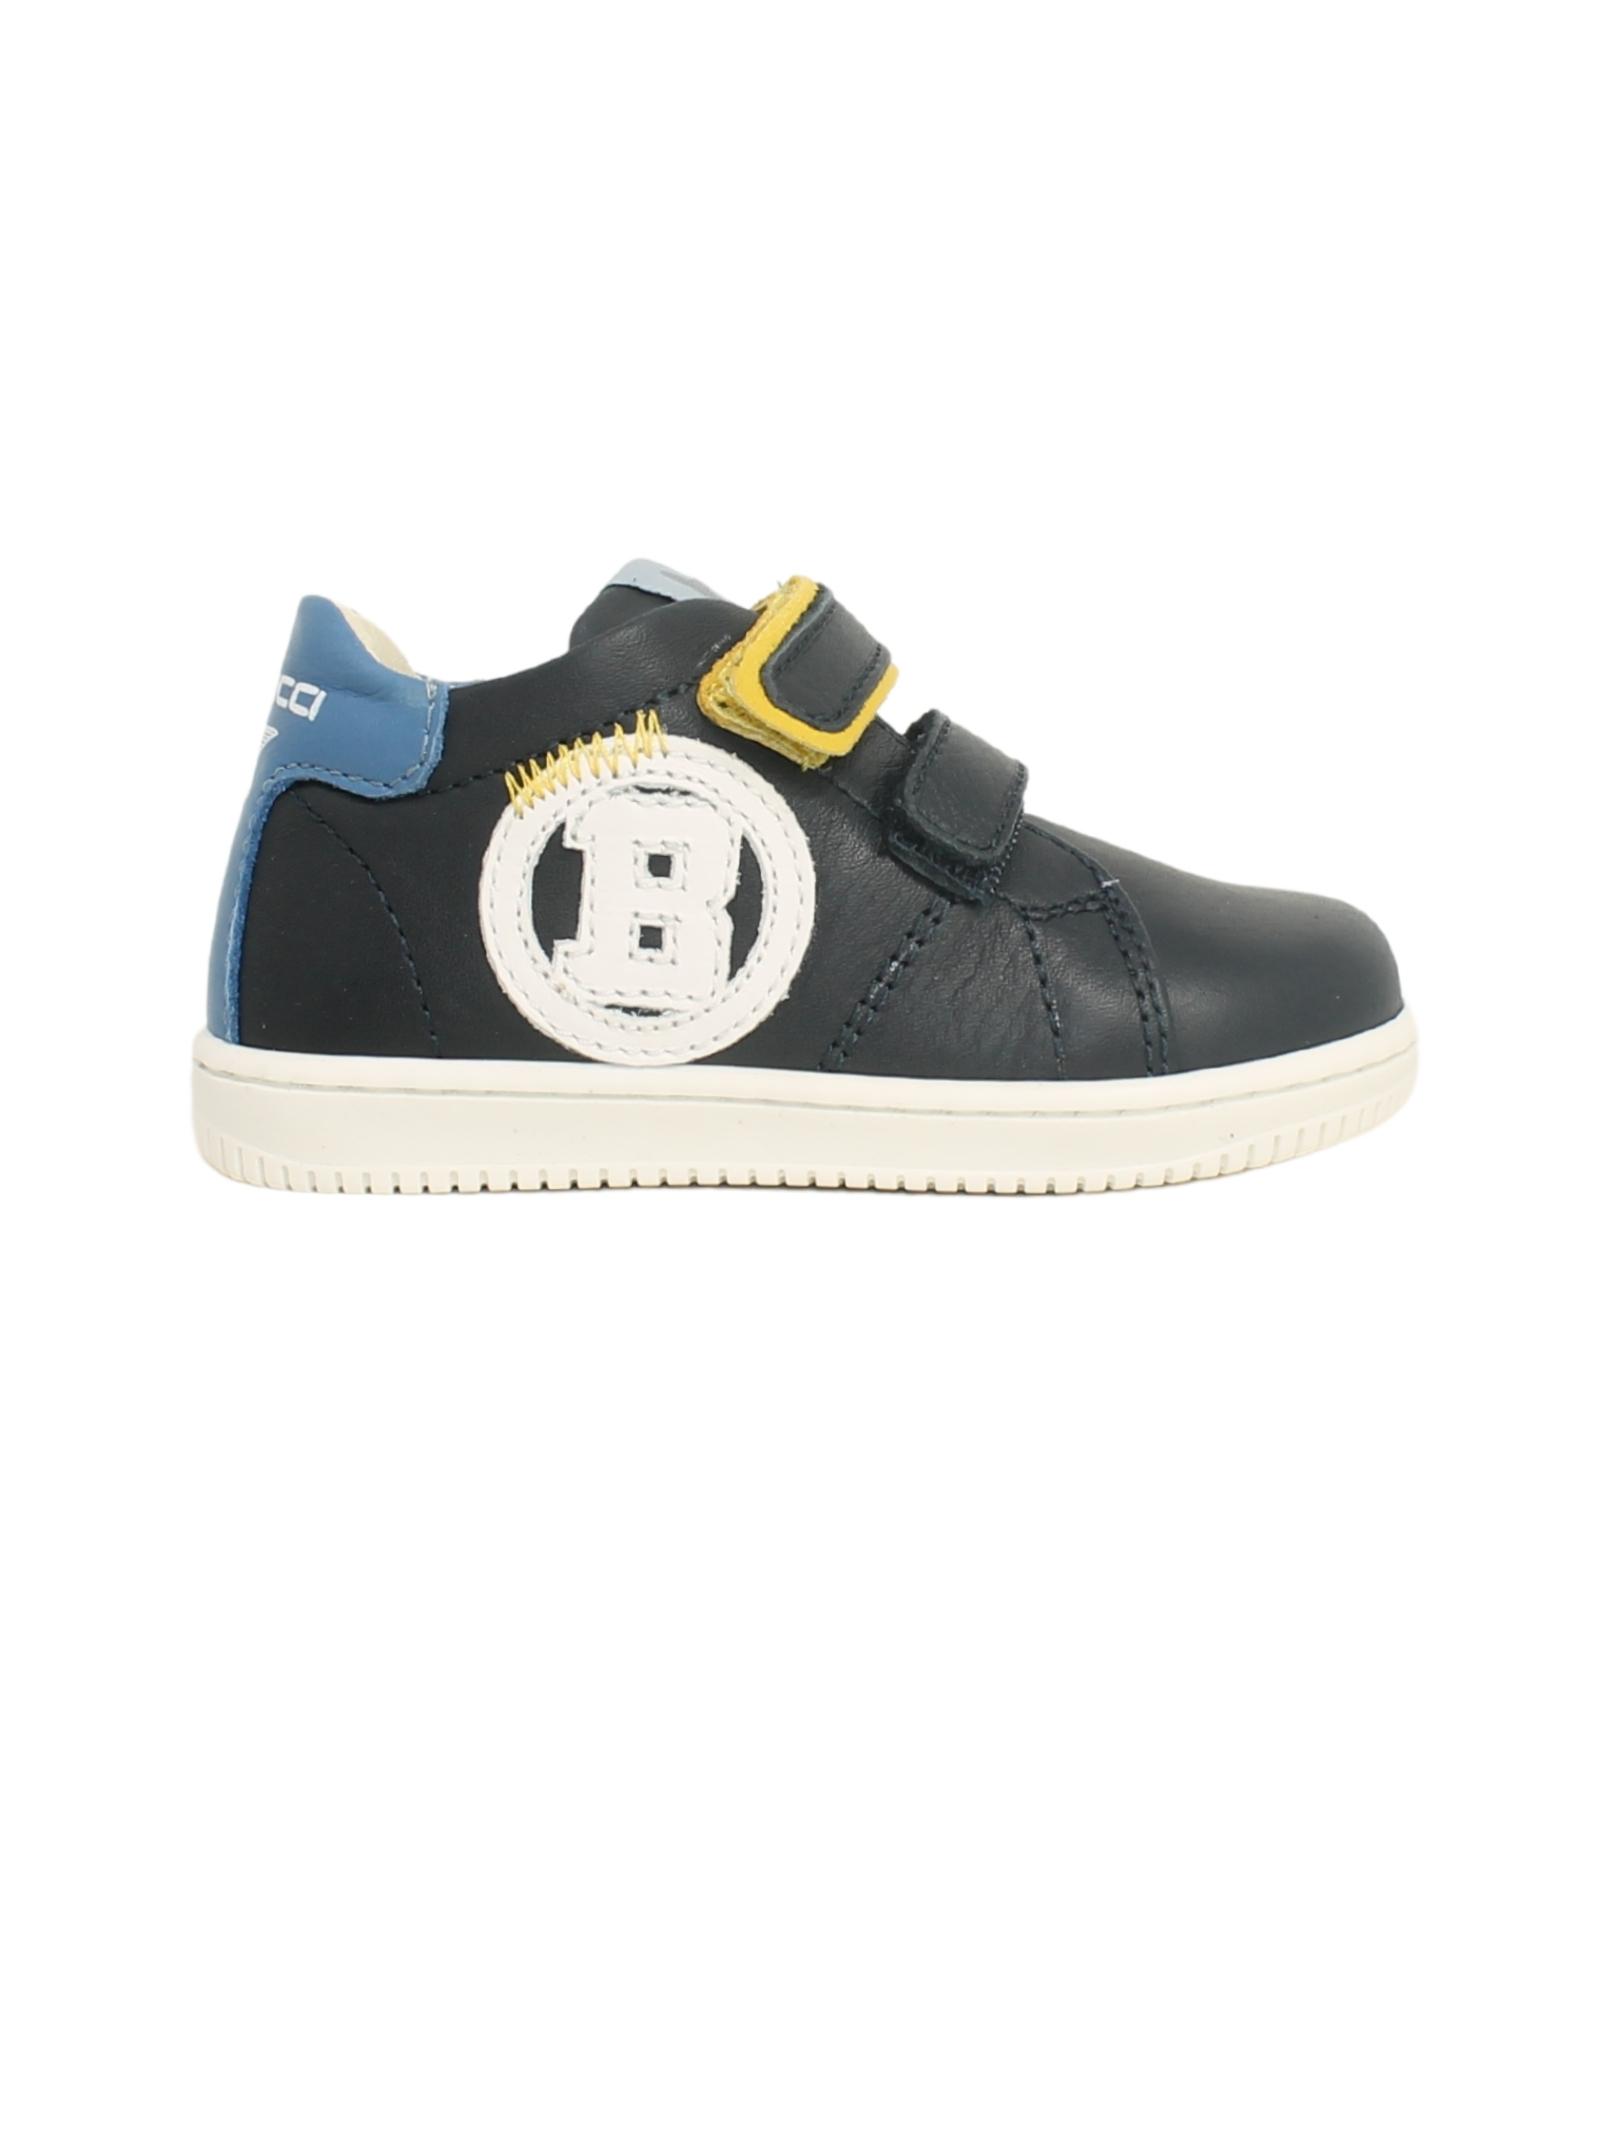 Sneakers Bassa Basic Bambino BALDUCCI | Sneakers | MSPO3841BLU